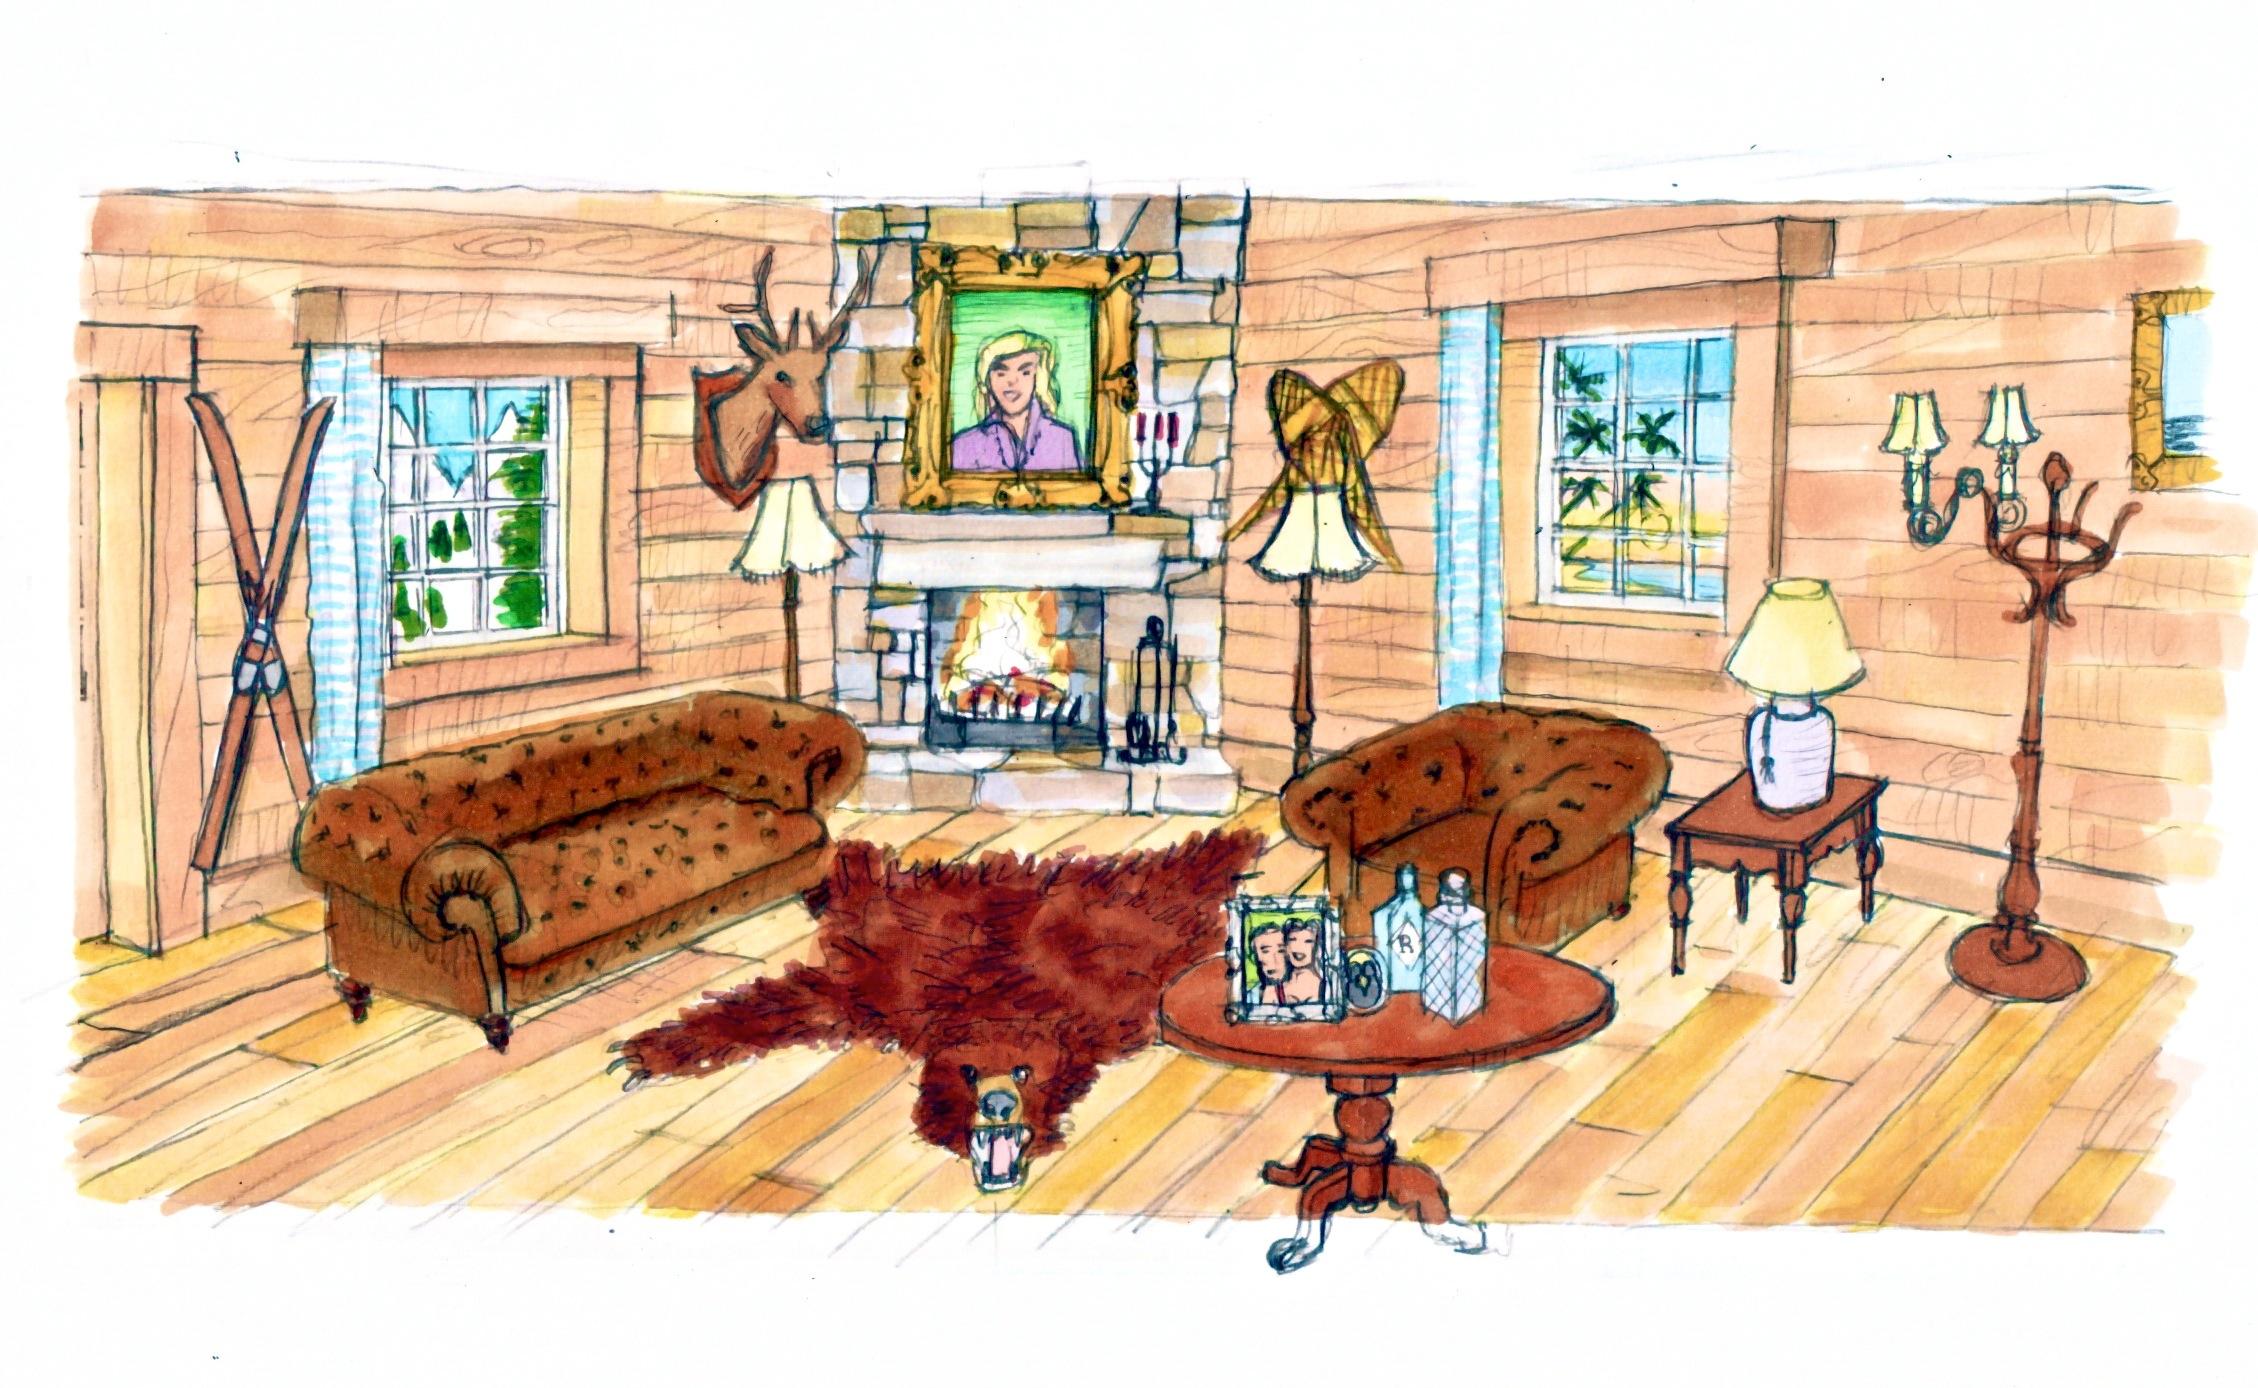 Concept illustration of log cabin interior